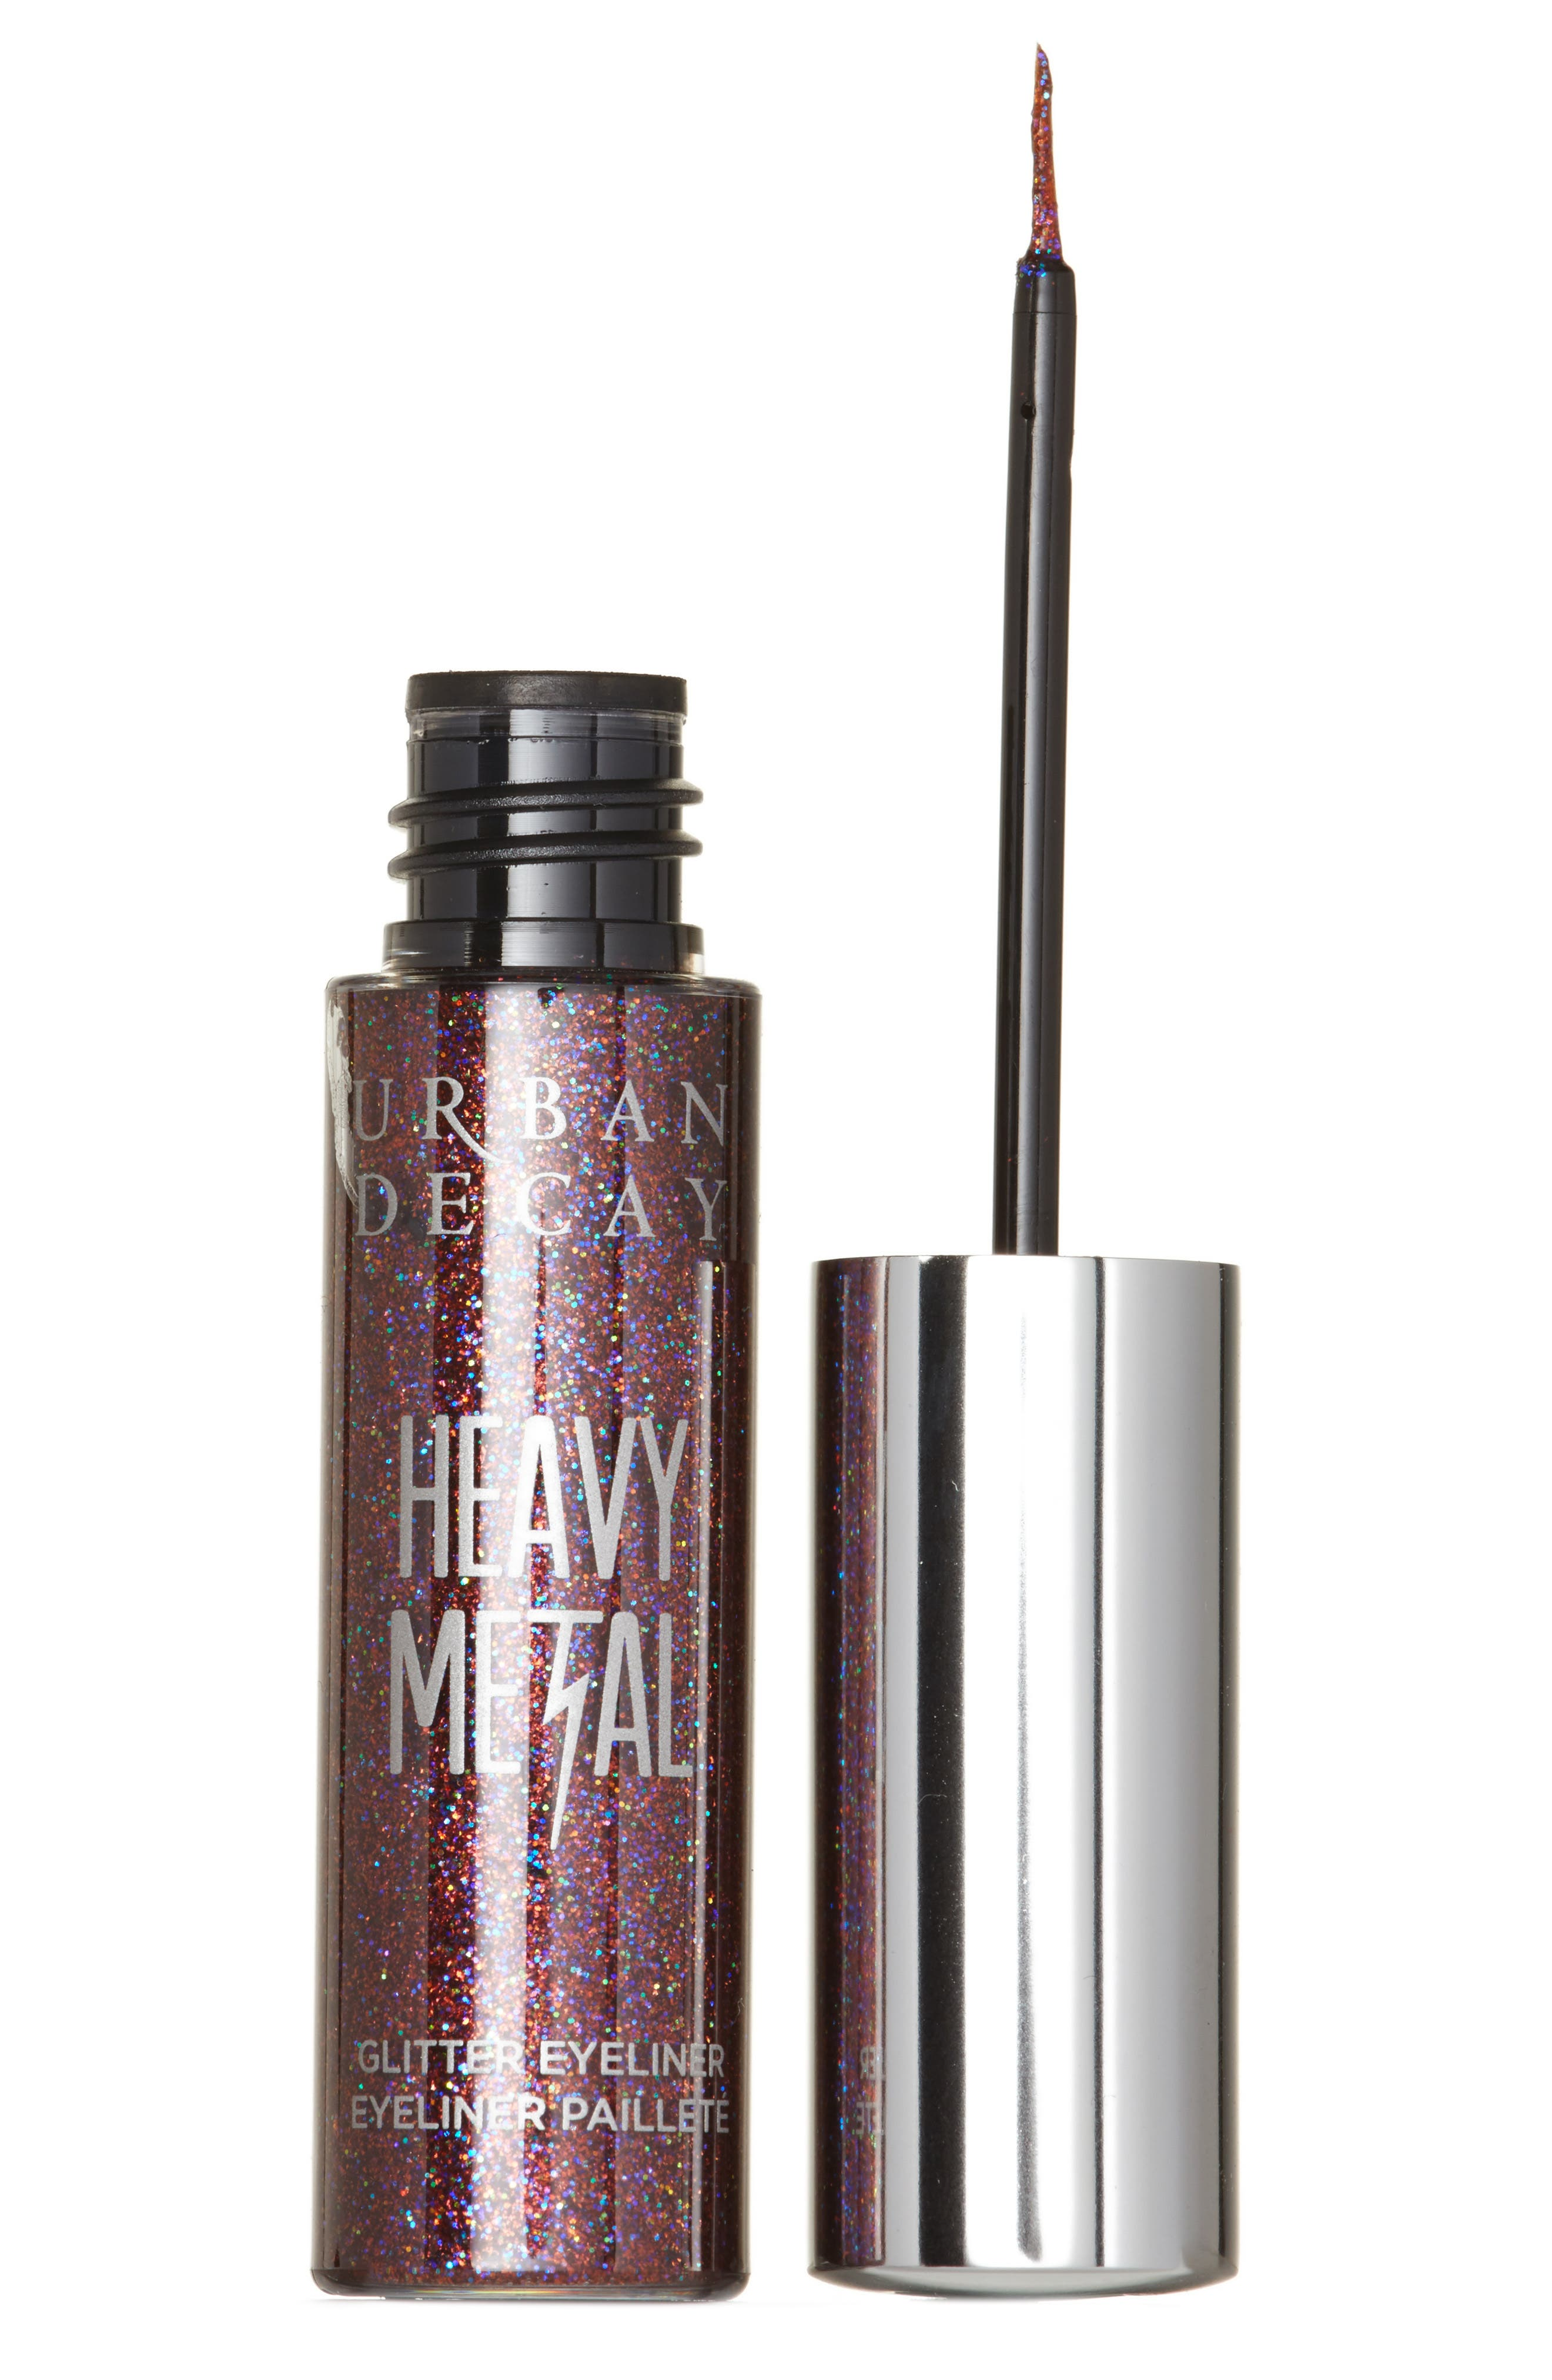 Main Image - Urban Decay Heavy Metal Glitter Eyeliner